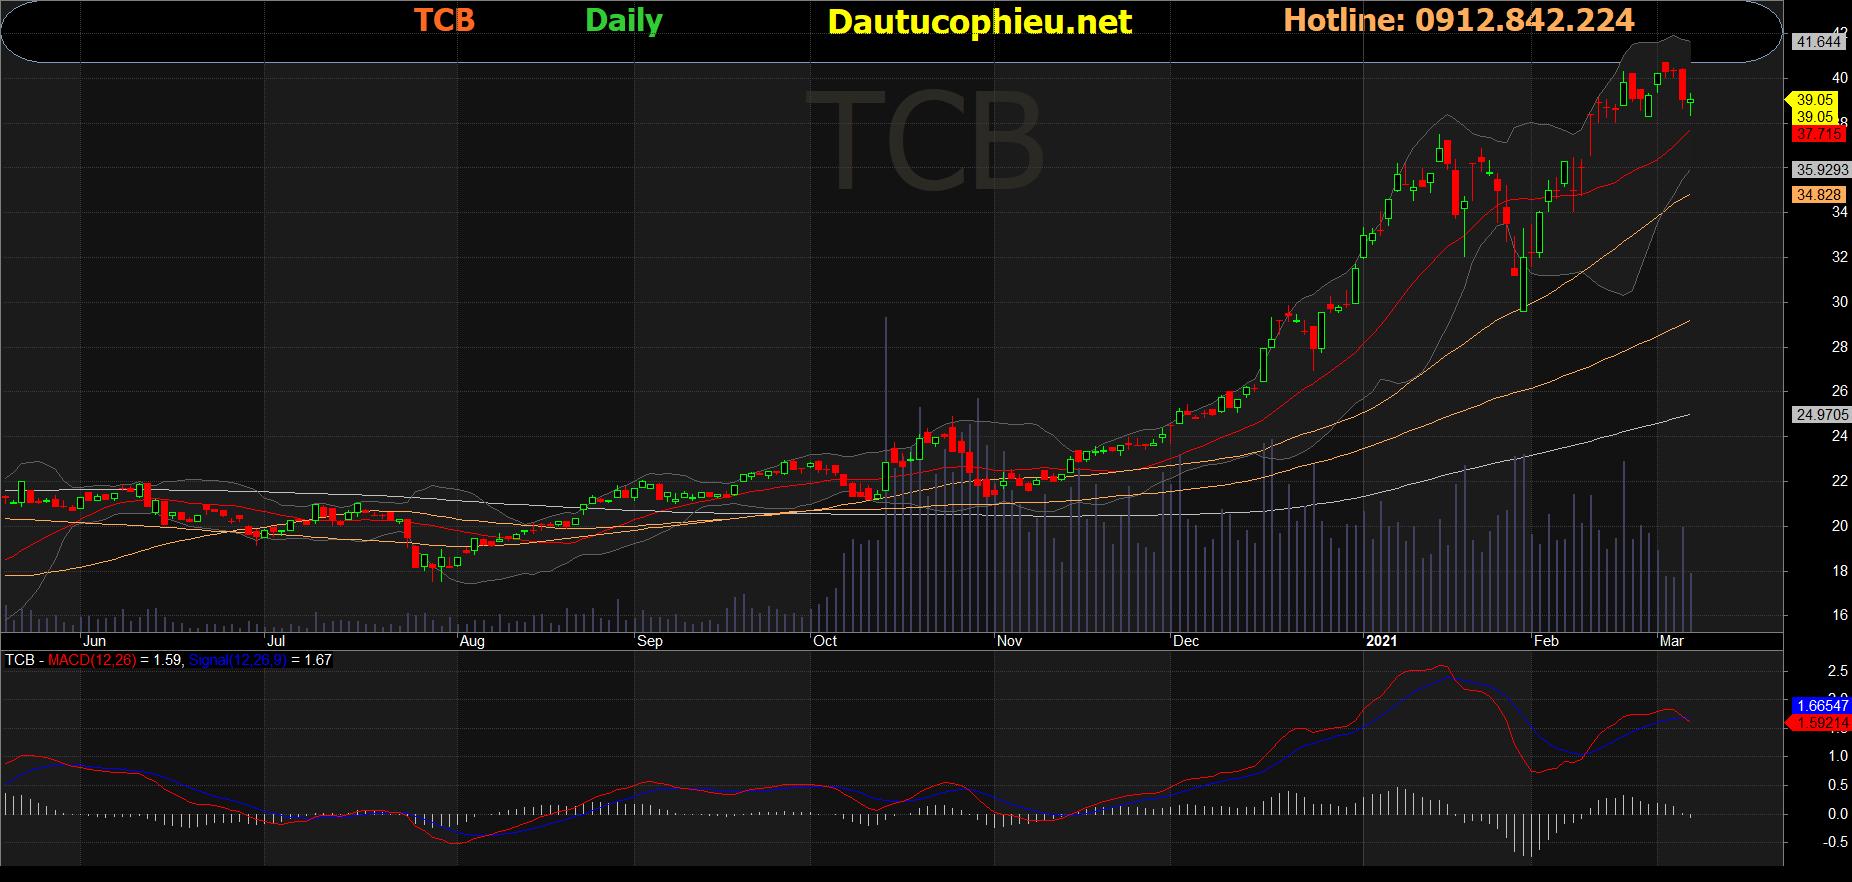 Cổ phiếu TCB